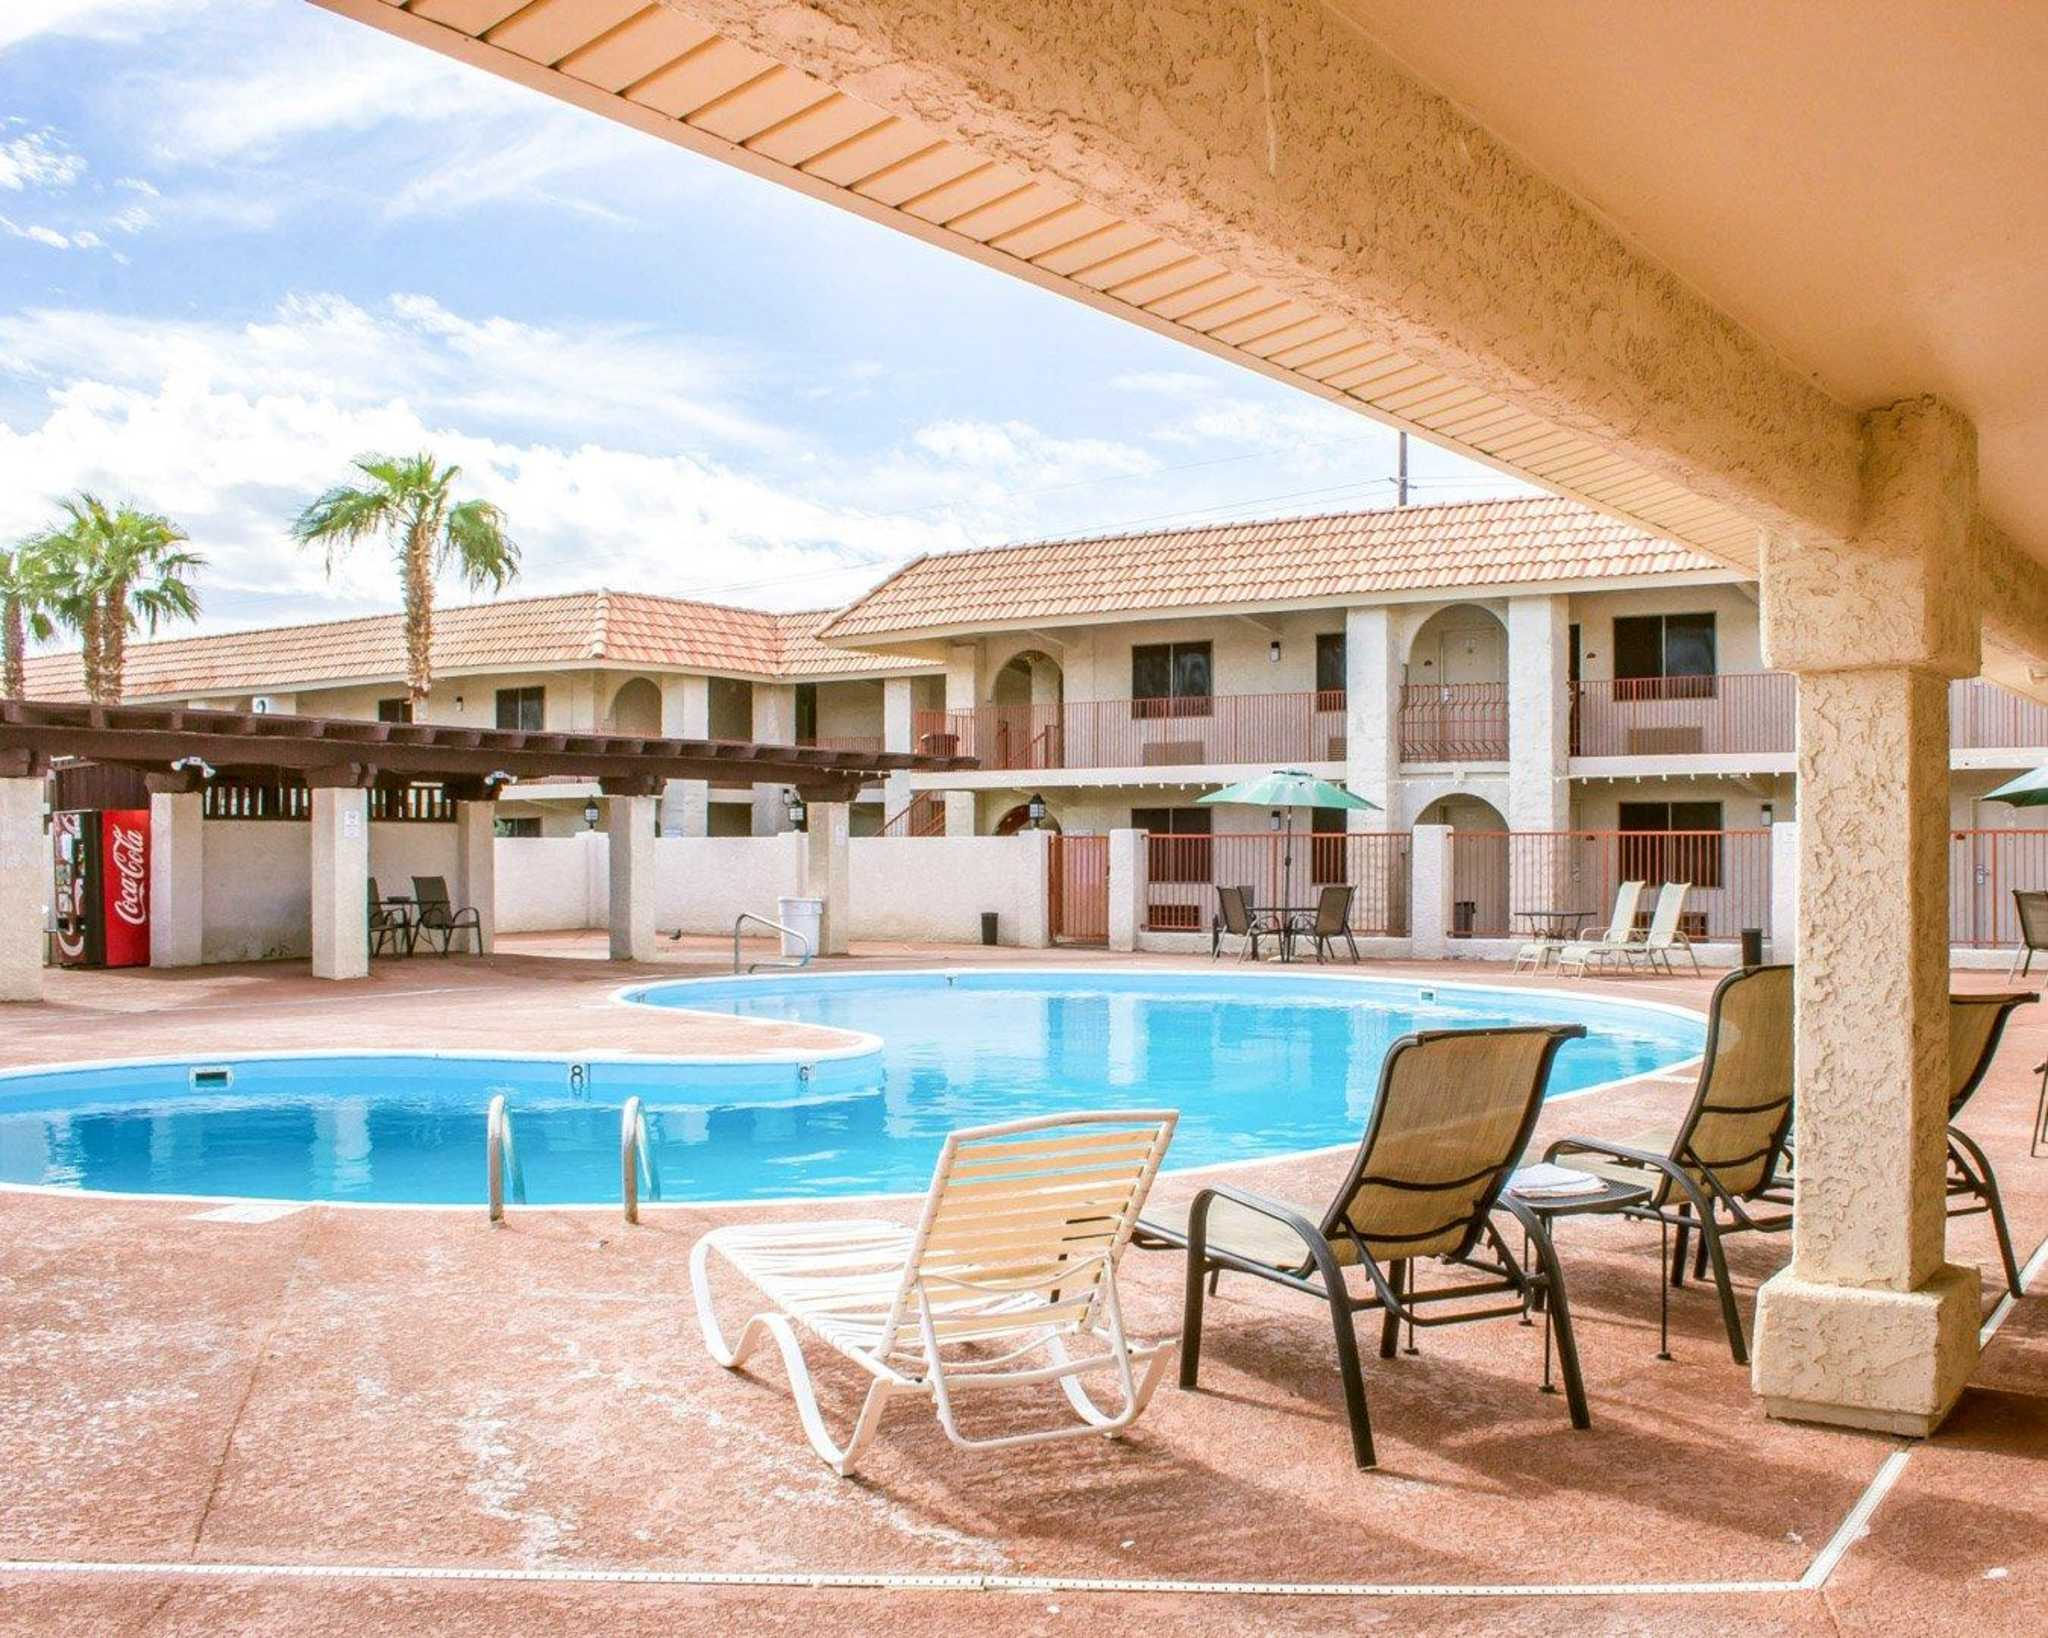 Sun City Az Hotels Motels